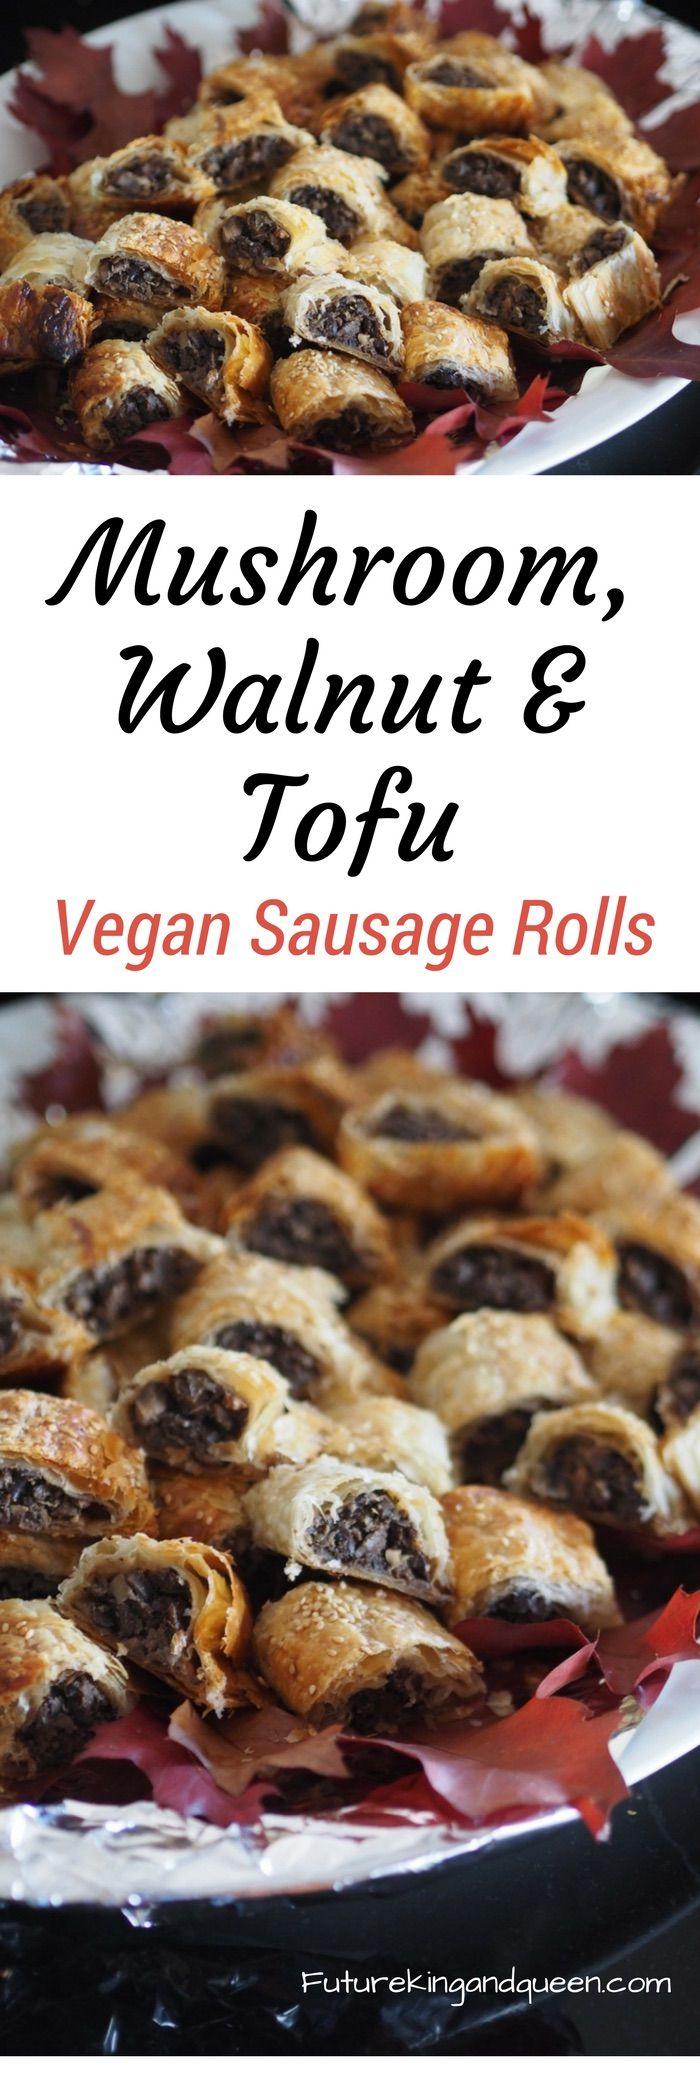 Mushroom, Walnut & Tofu Sausage Rolls — Future King and Queen